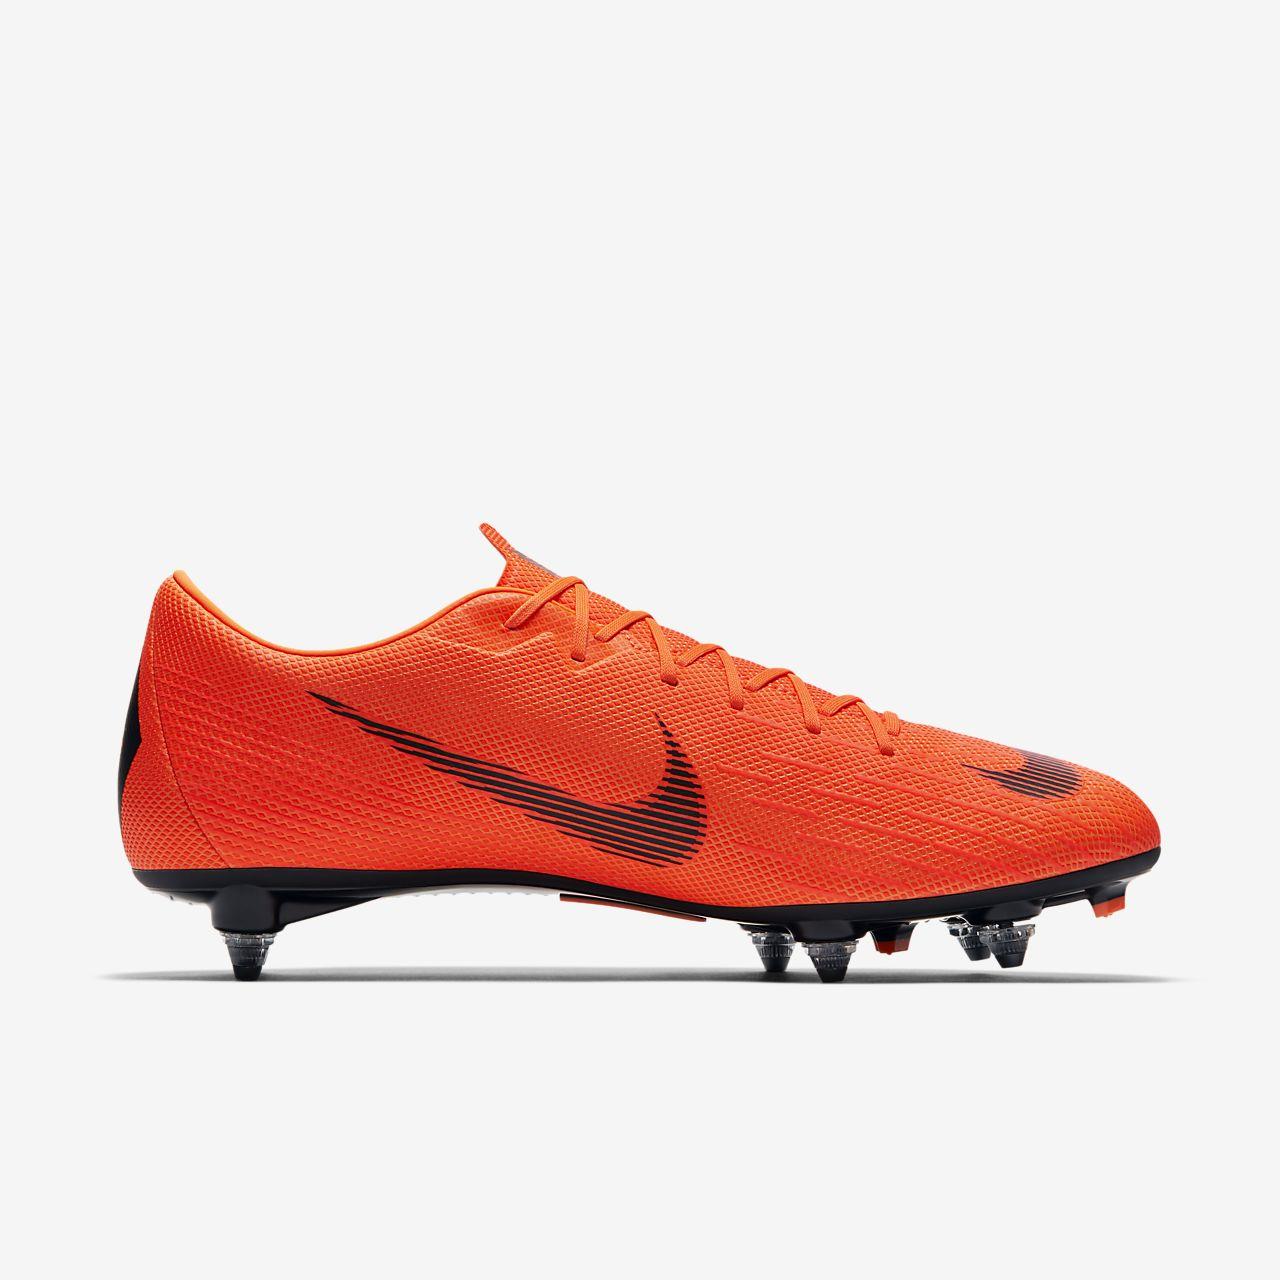 993ff8ef2771 Nike Mercurial Vapor XII Academy SG-PRO Soft-Ground Football Boot